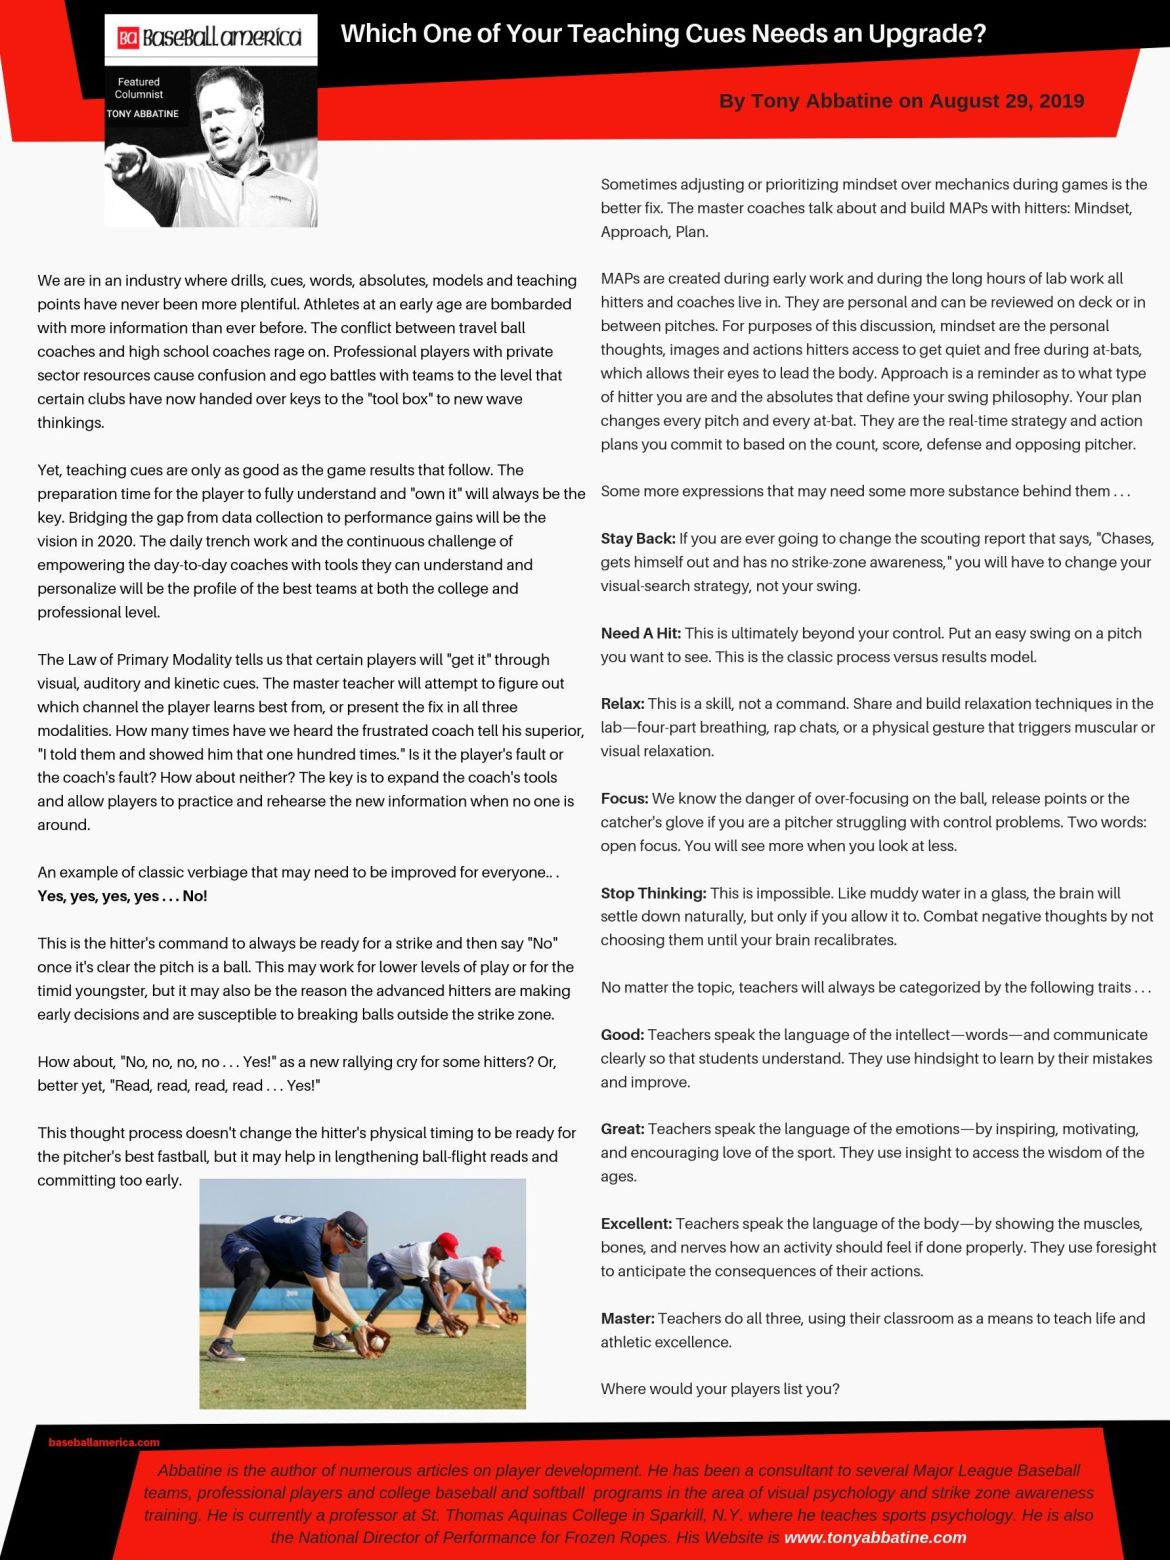 Tony Abbatine bi-weekly column in Baseball America: Upgrade to Teaching Cues